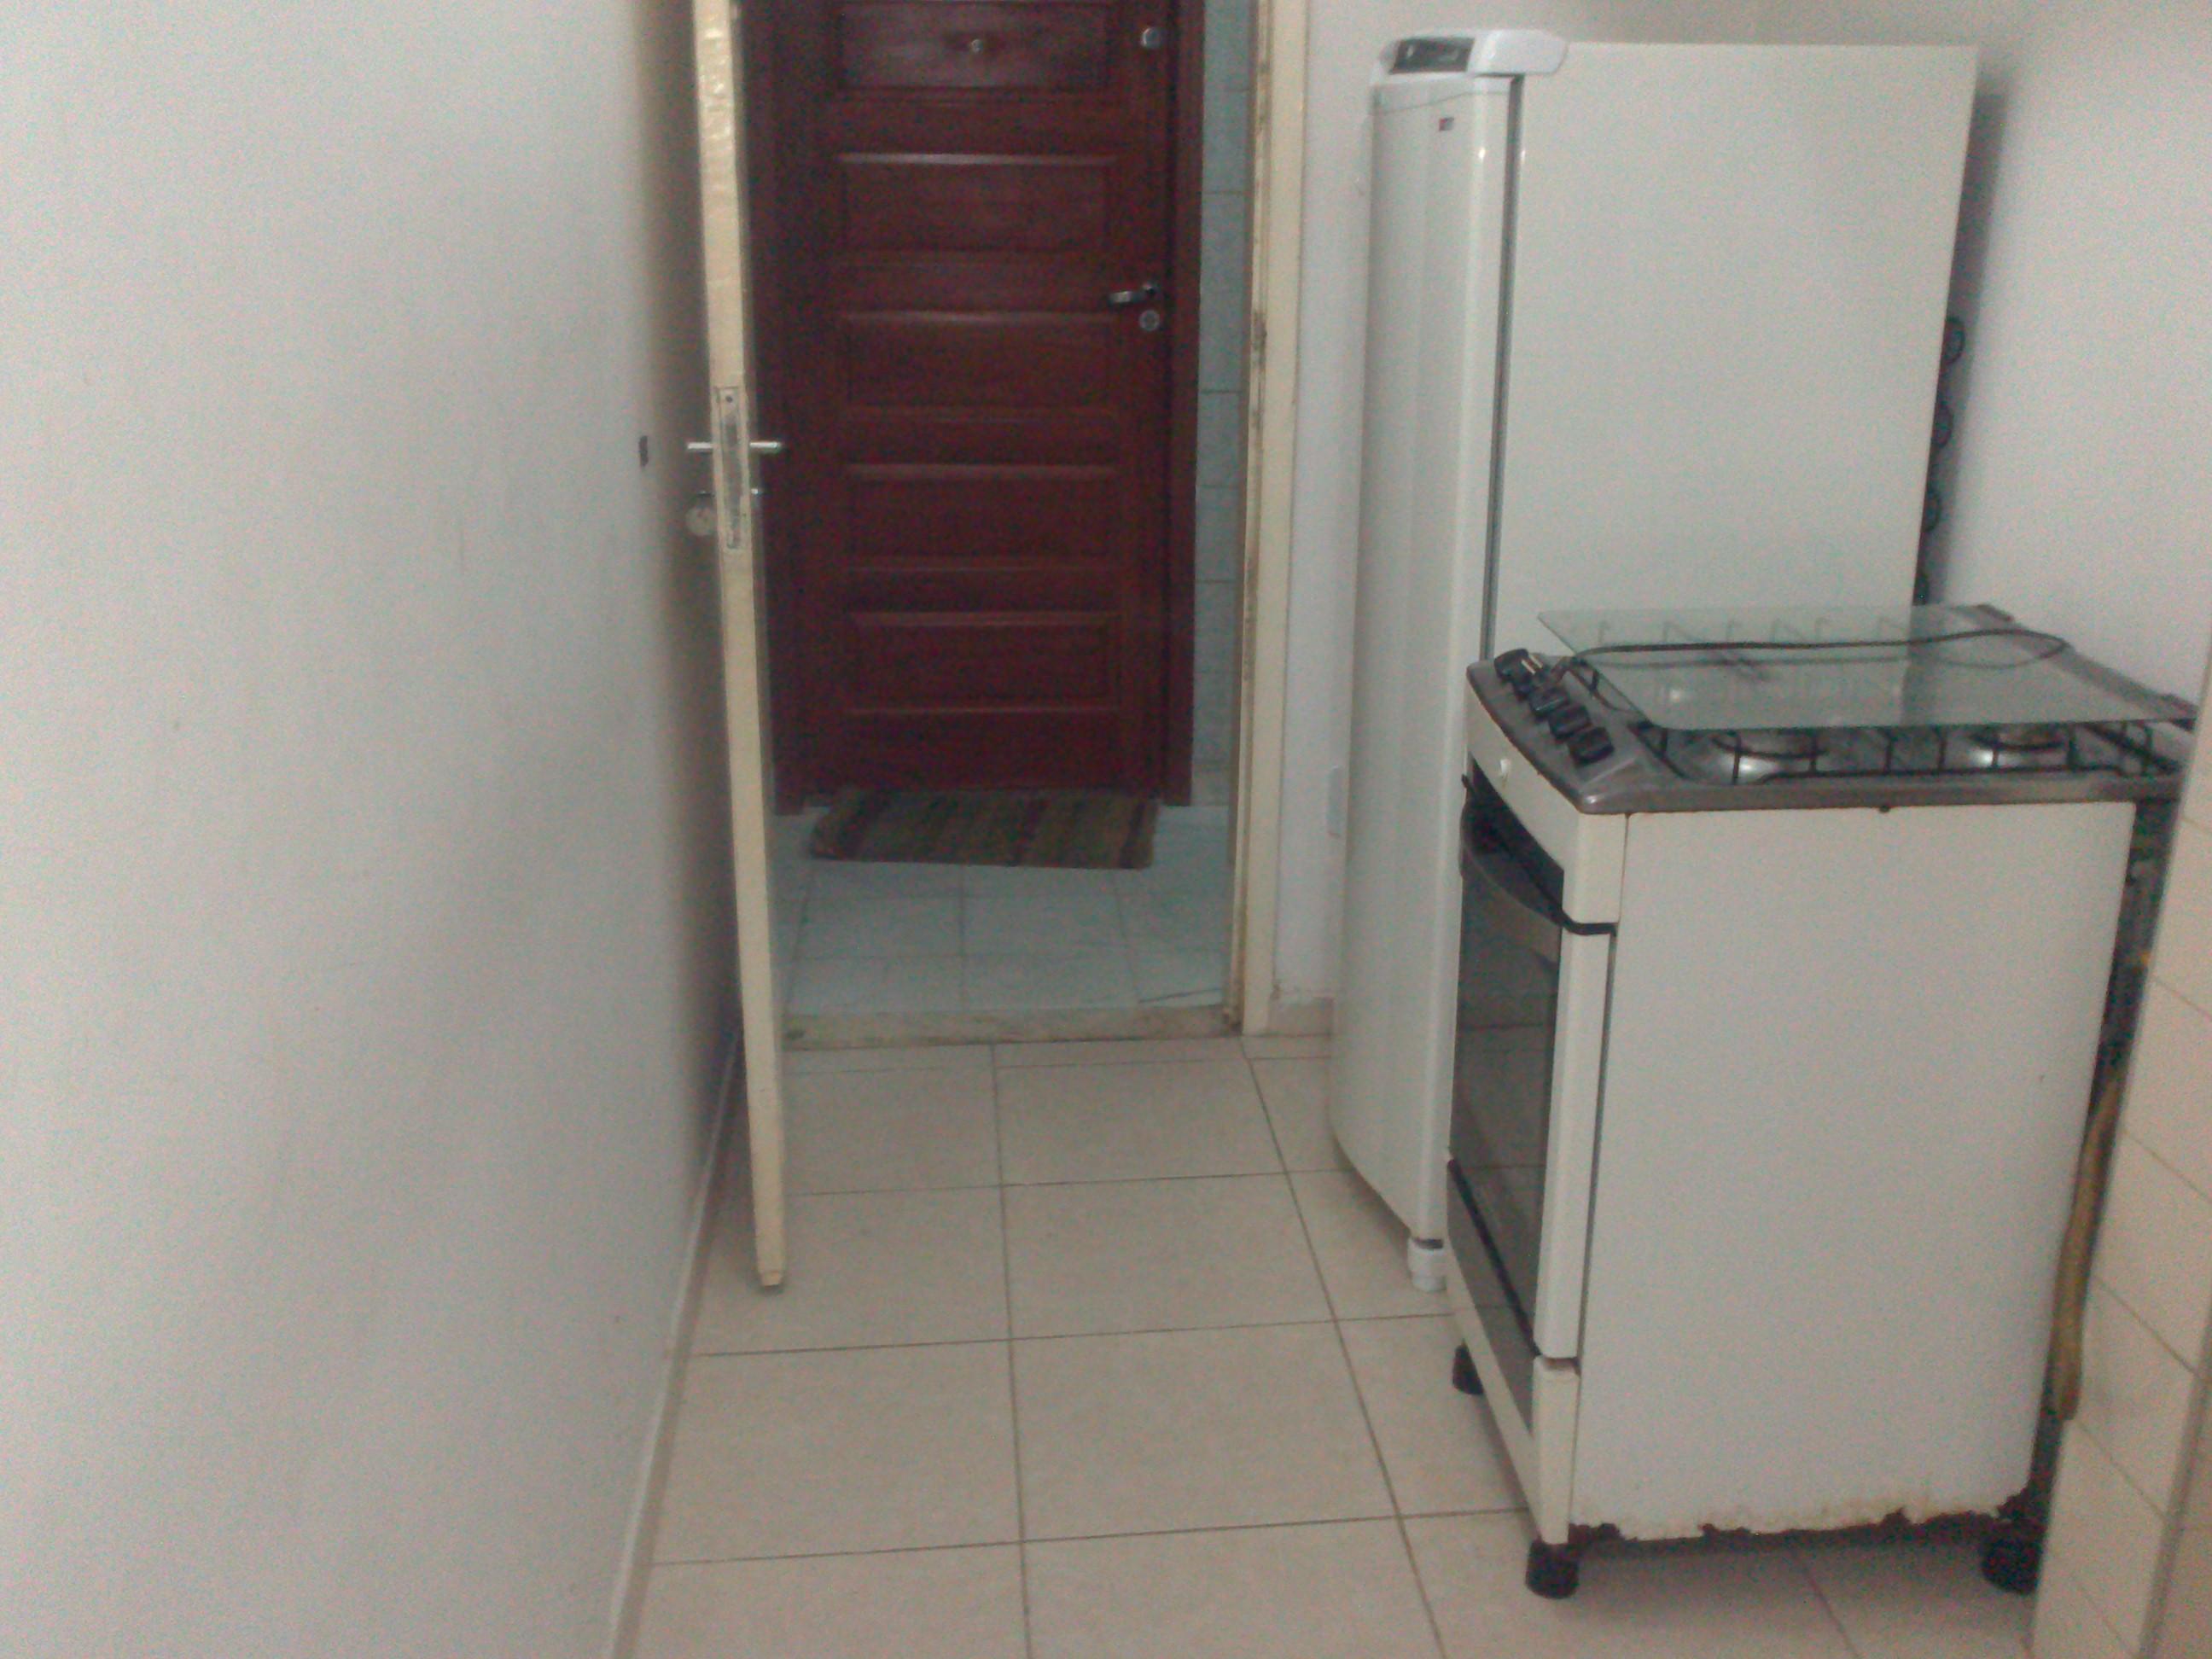 FOTO11 - Apartamento à venda Avenida Princesa Isabel,Copacabana, IMOBRAS RJ - R$ 442.000 - AP1297 - 13